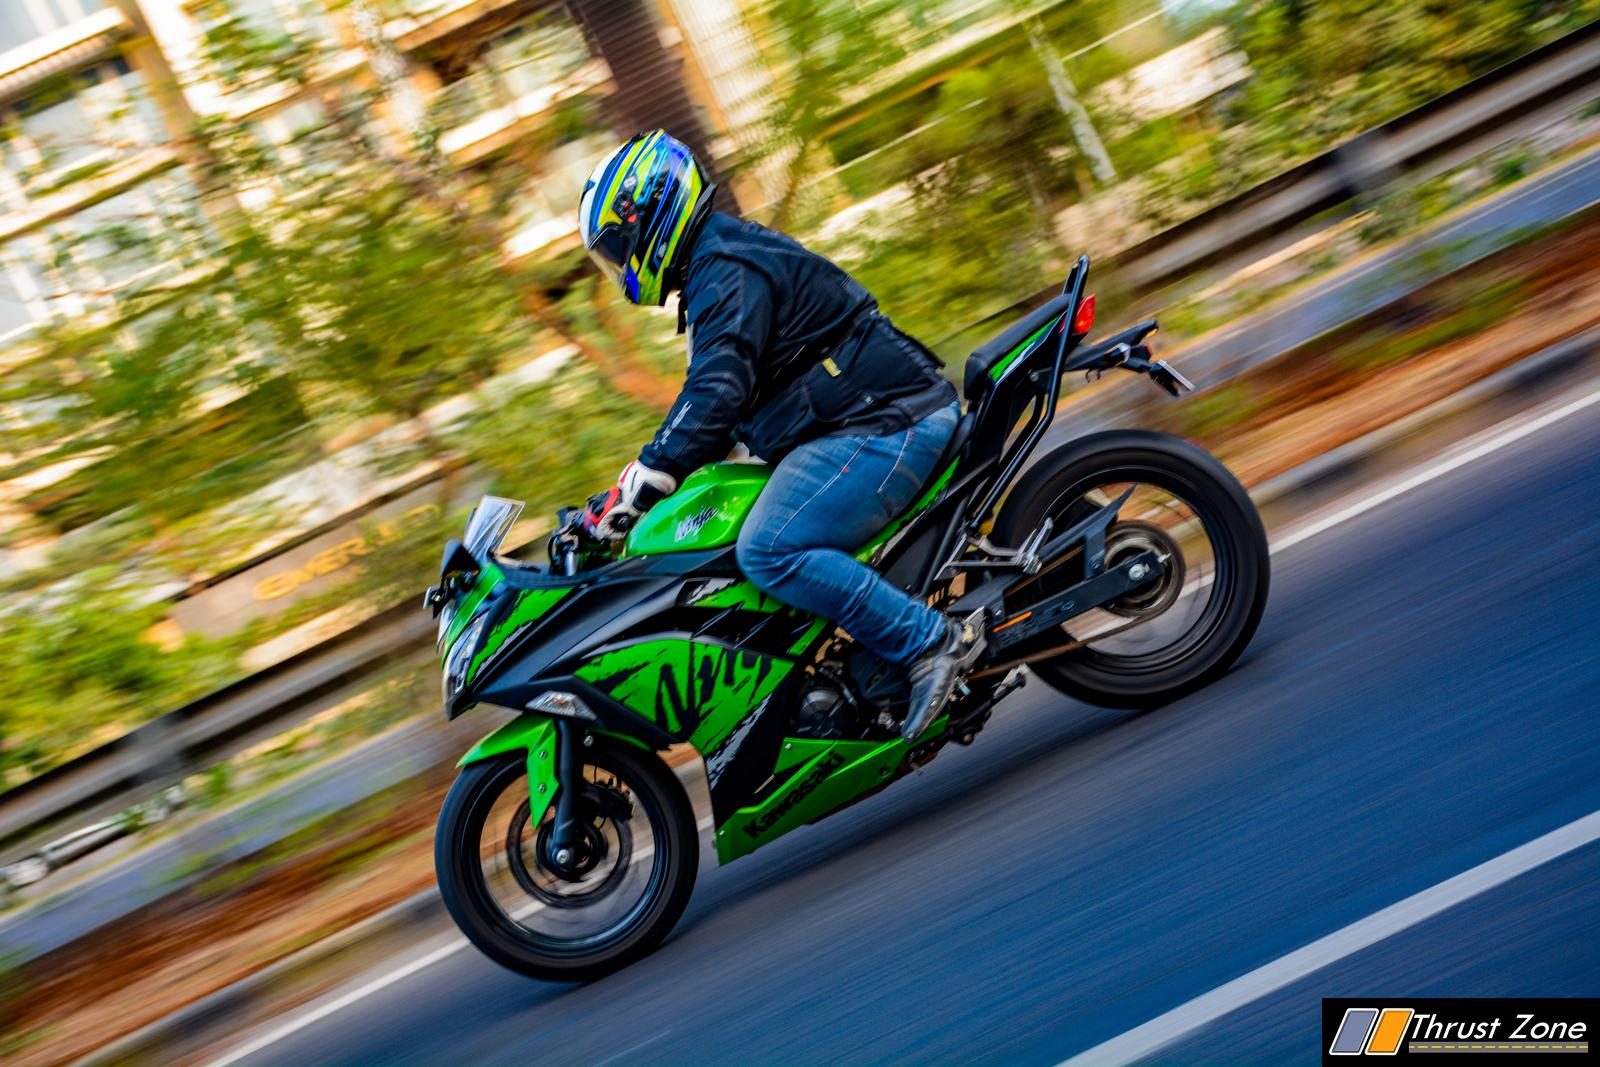 http://www.thrustzone.com/wp-content/uploads/2019/01/2018-kawasaki-ninja-300-india-review-20.jpg